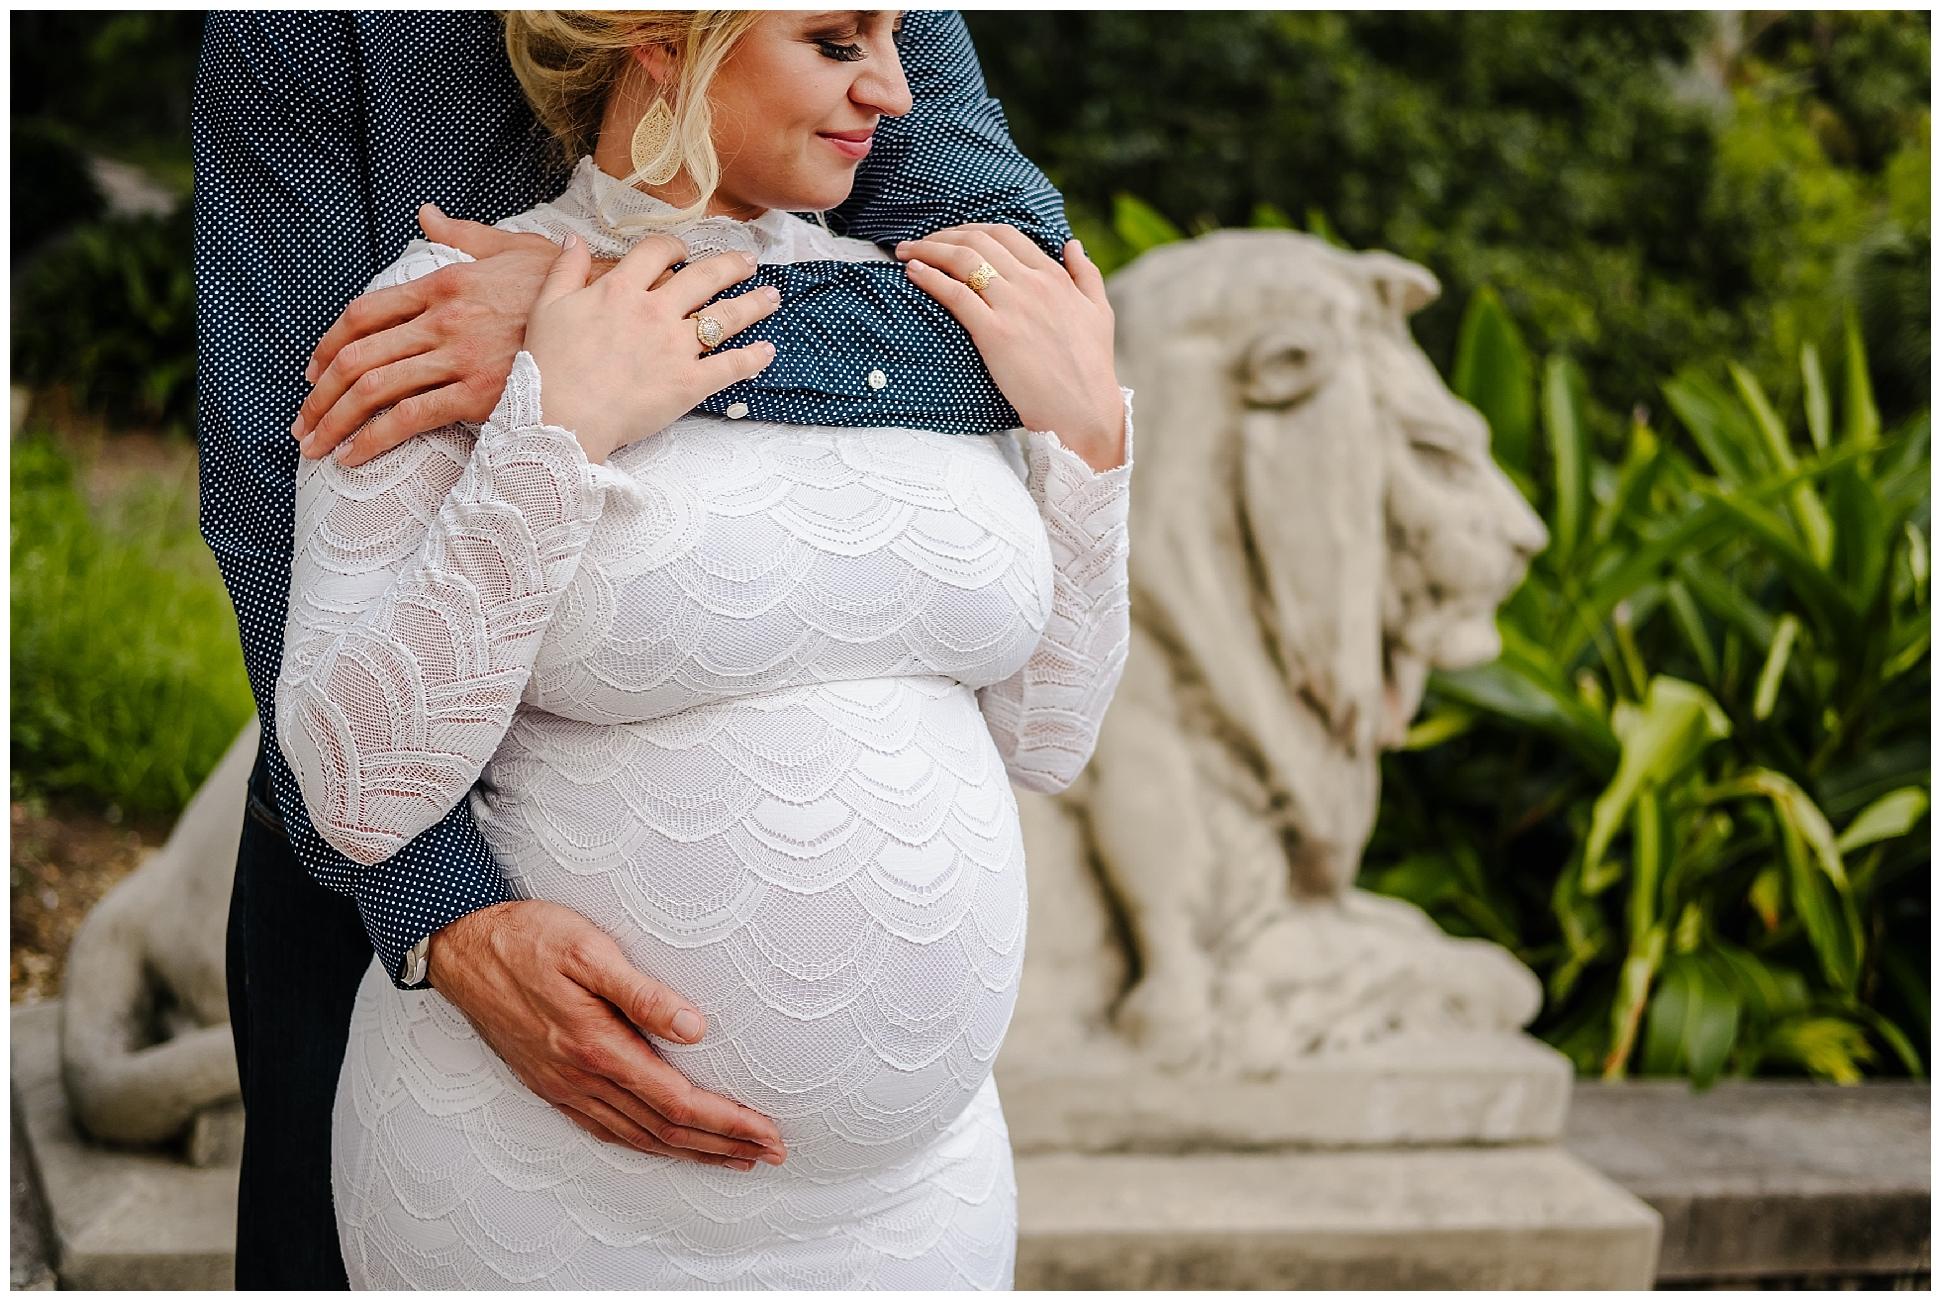 nola-maternity-portraits-beach-body-summit_7.jpg